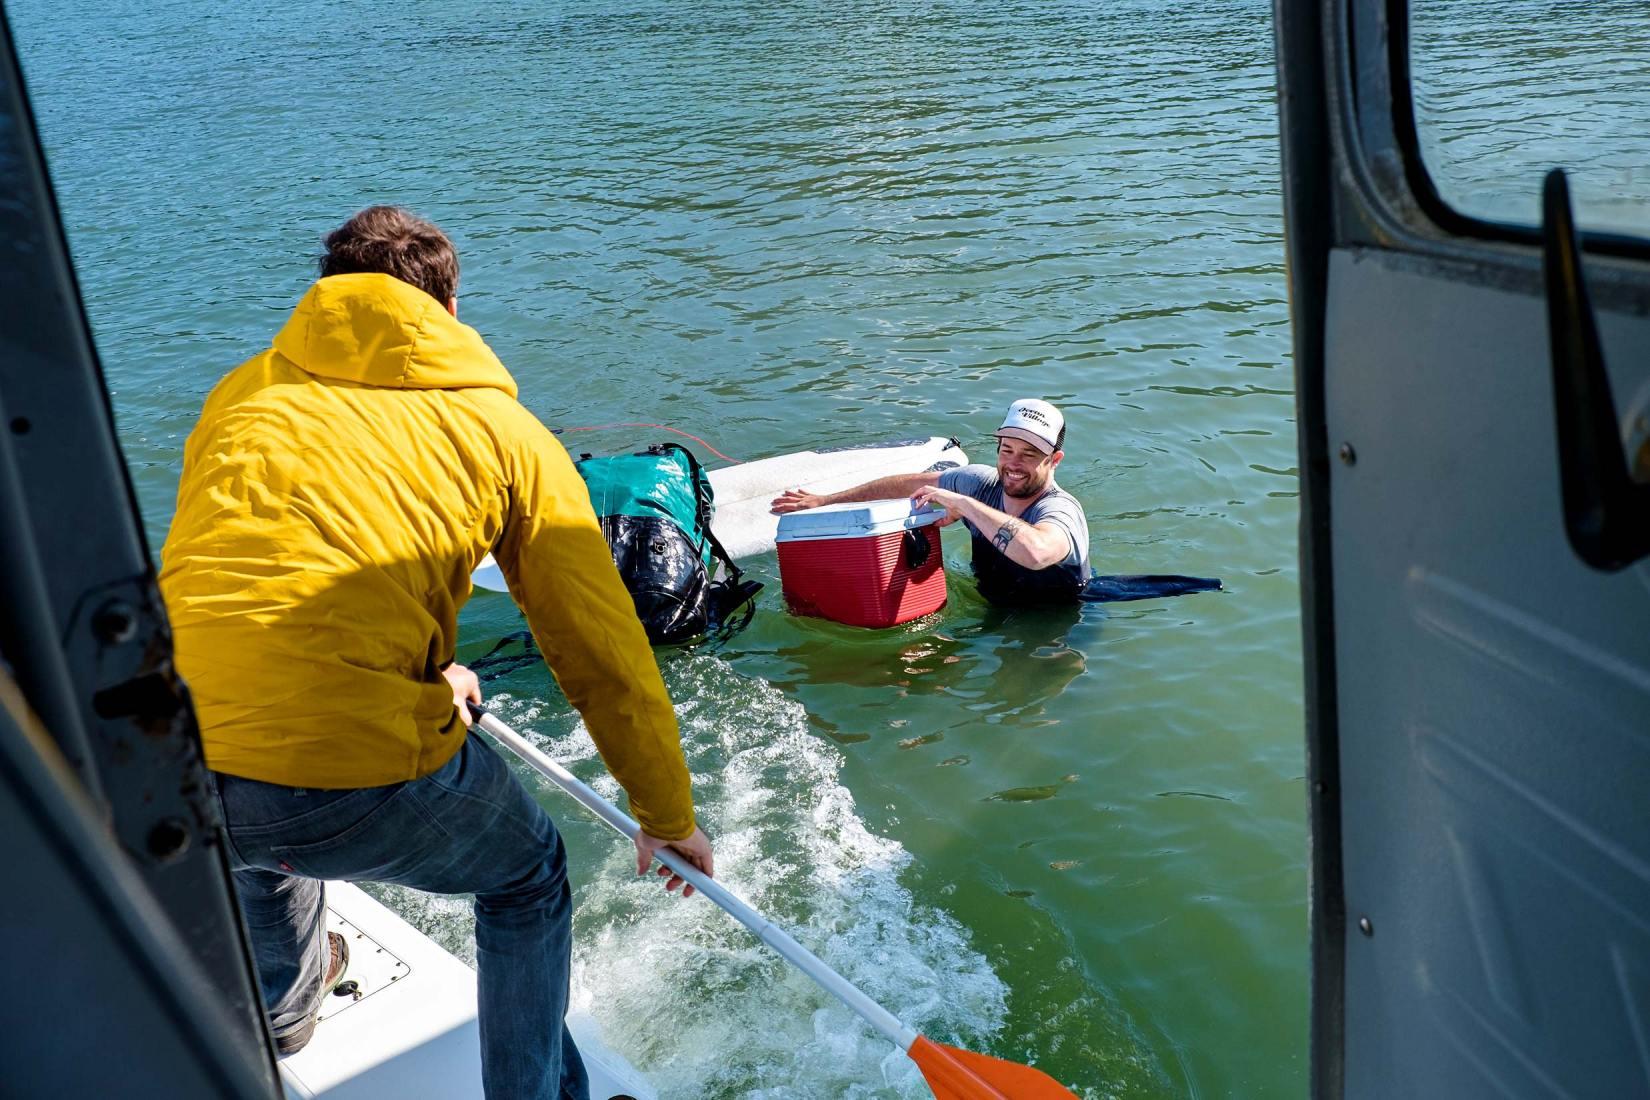 PWS015-0529-Sharon-Blance-photographer-Tofino-travel-editorial-float-sea-plant-atleo-air